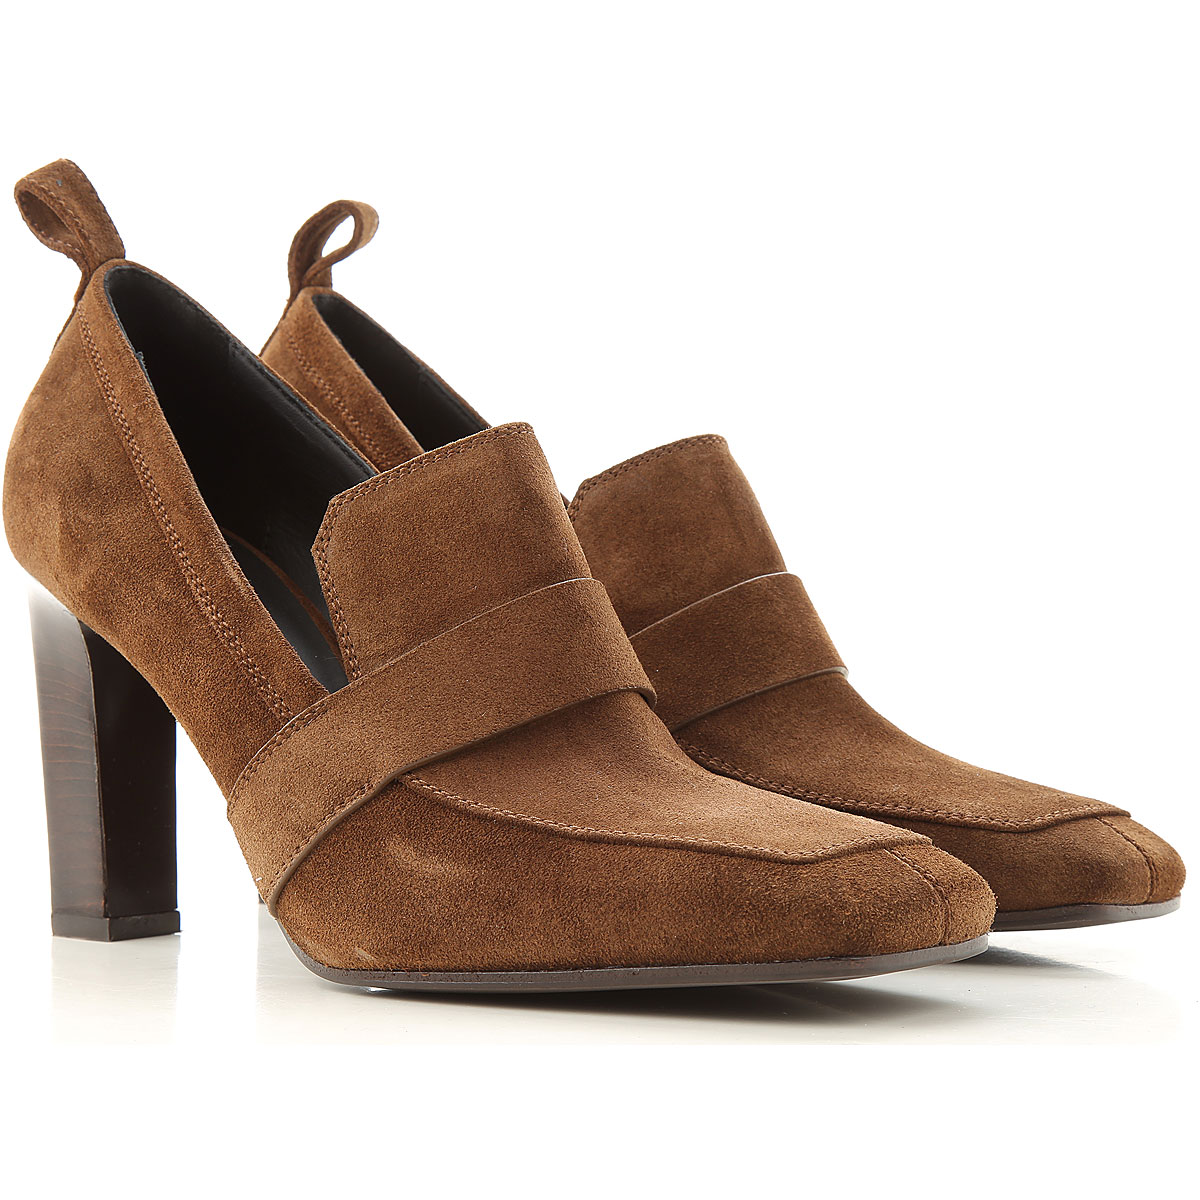 Lella Baldi Pumps & High Heels for Women On Sale, Brown, Suede leather, 2019, 6 7 8 9